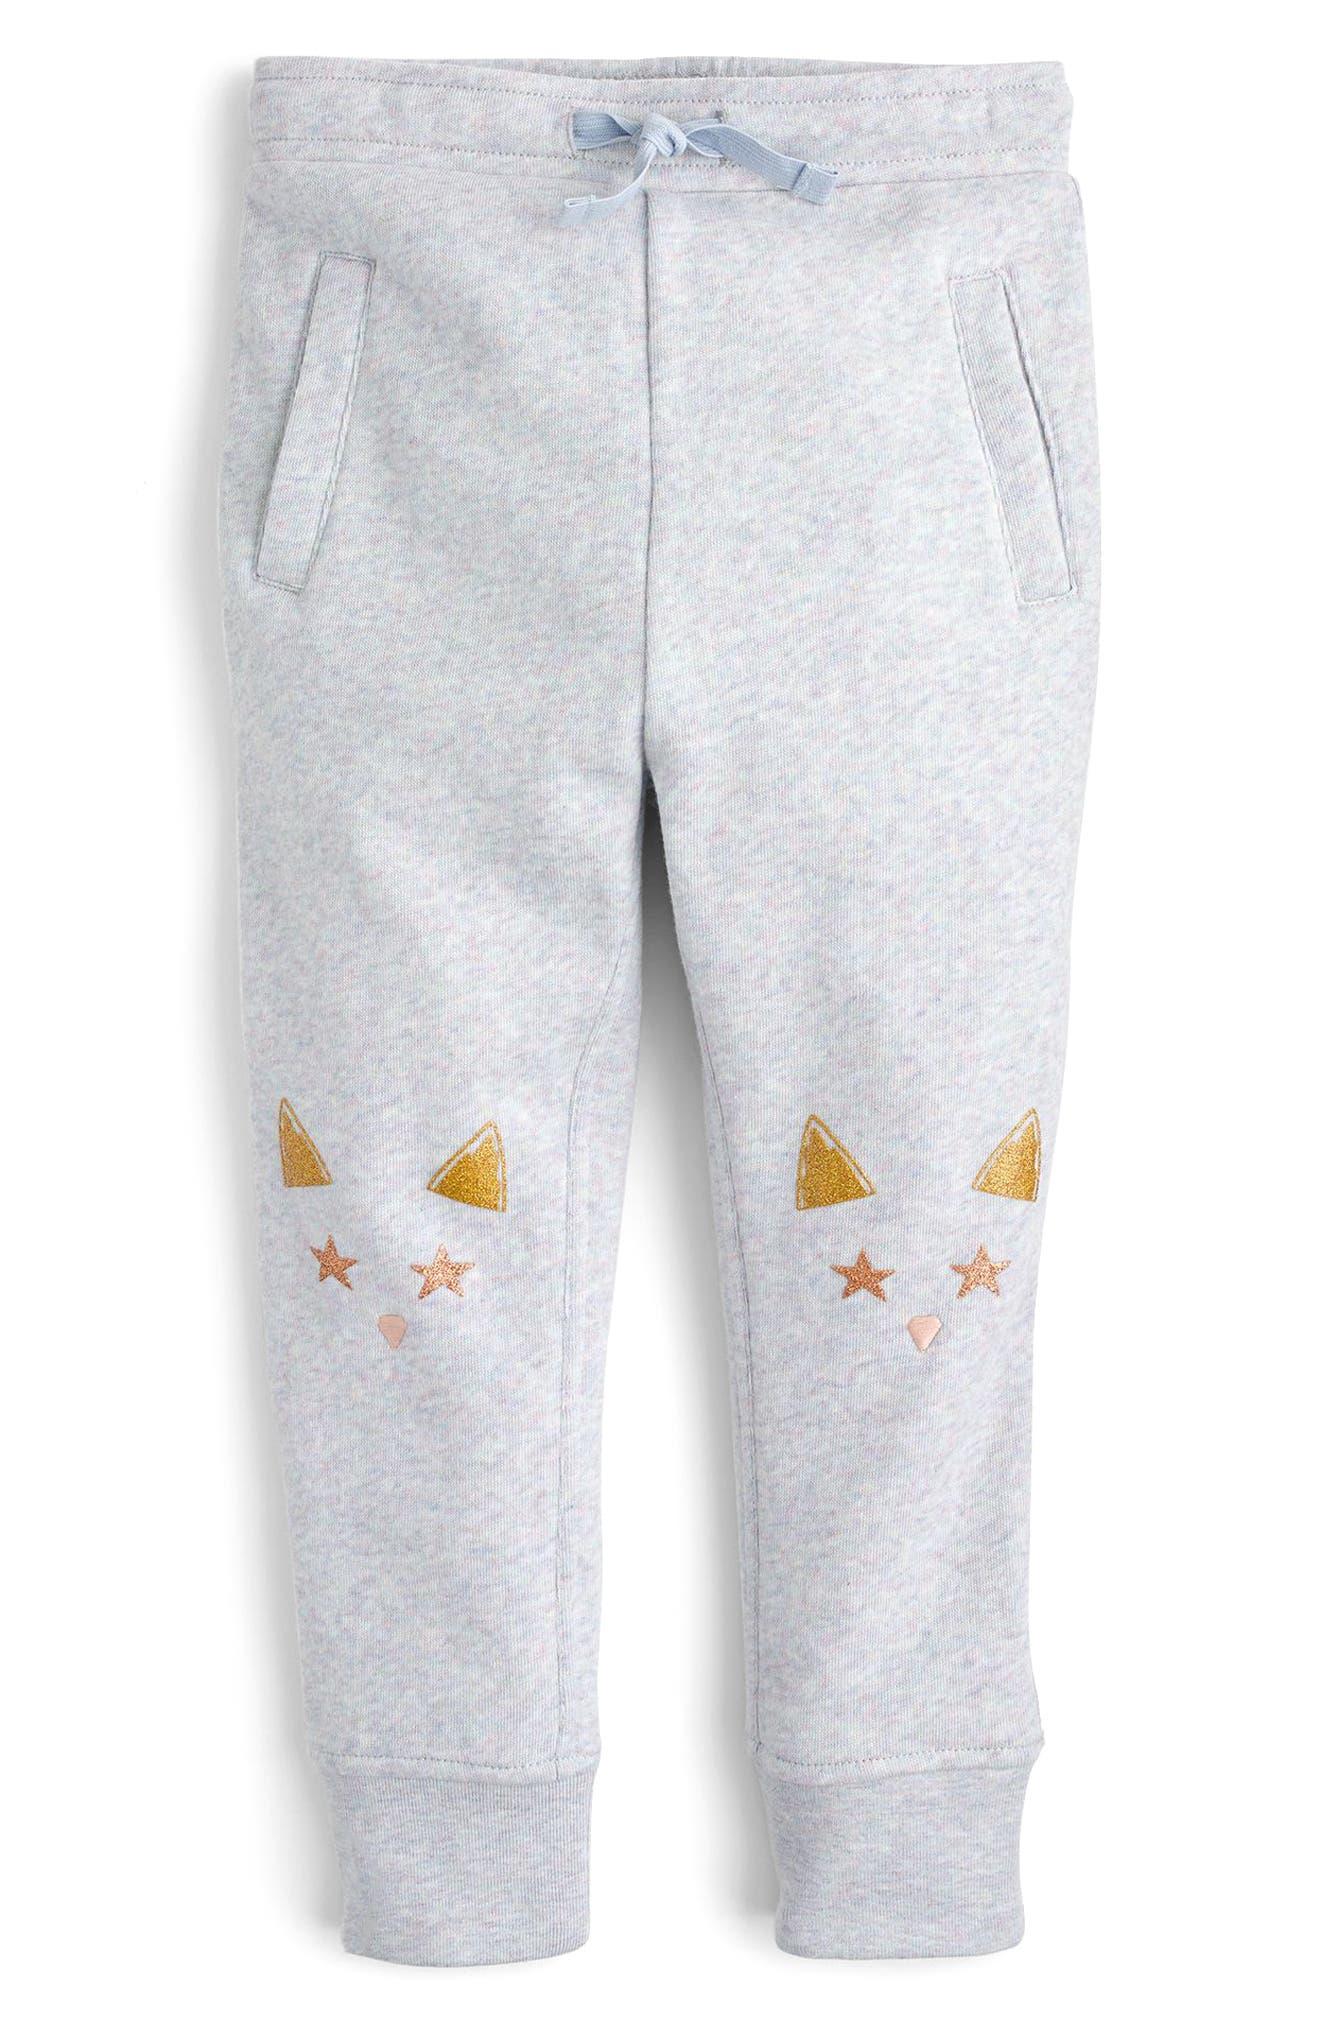 Cat Knee Sweatpants,                             Main thumbnail 1, color,                             020